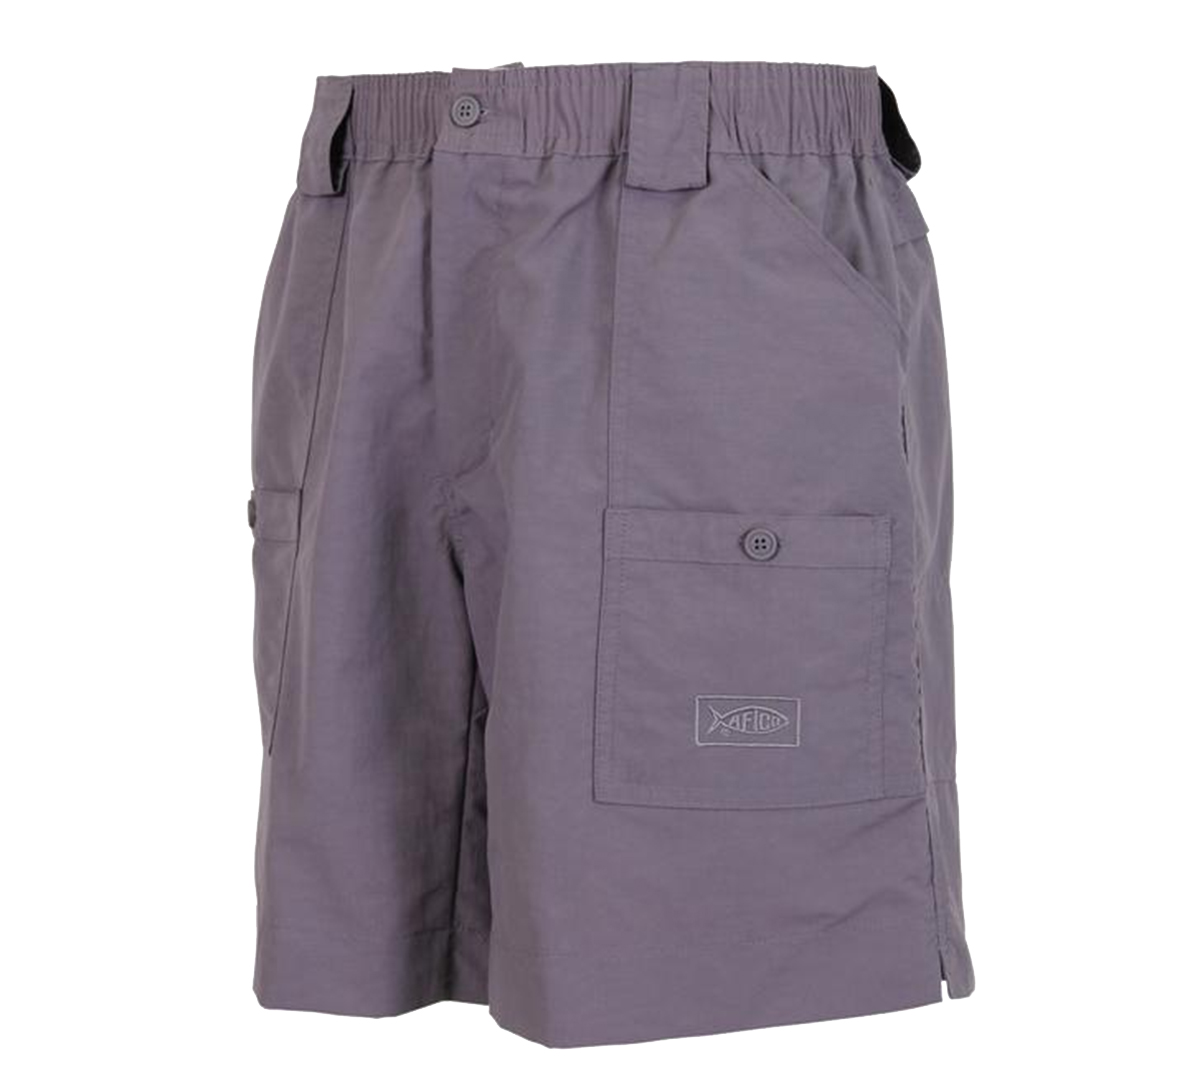 Aftco men 39 s original long fishing shorts ebay for Aftco original fishing shorts